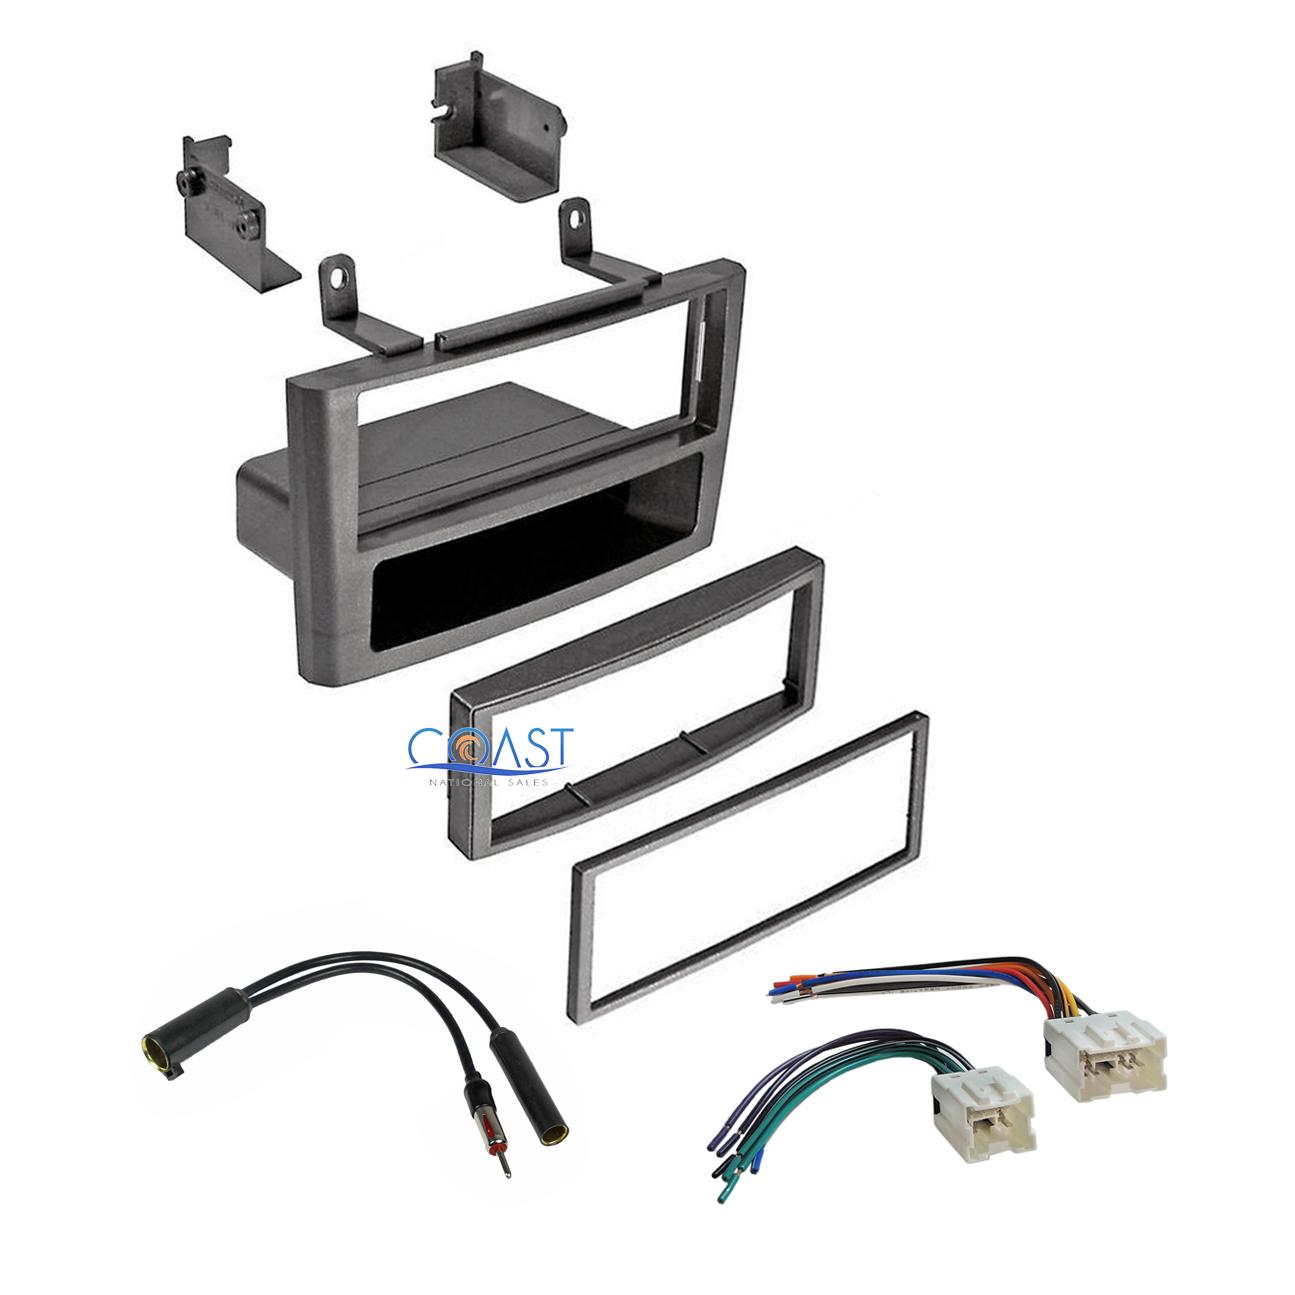 2000 nissan maxima antenna wiring car stereo grey dash kit wire harness antenna for 2000 2003 nissan  car stereo grey dash kit wire harness